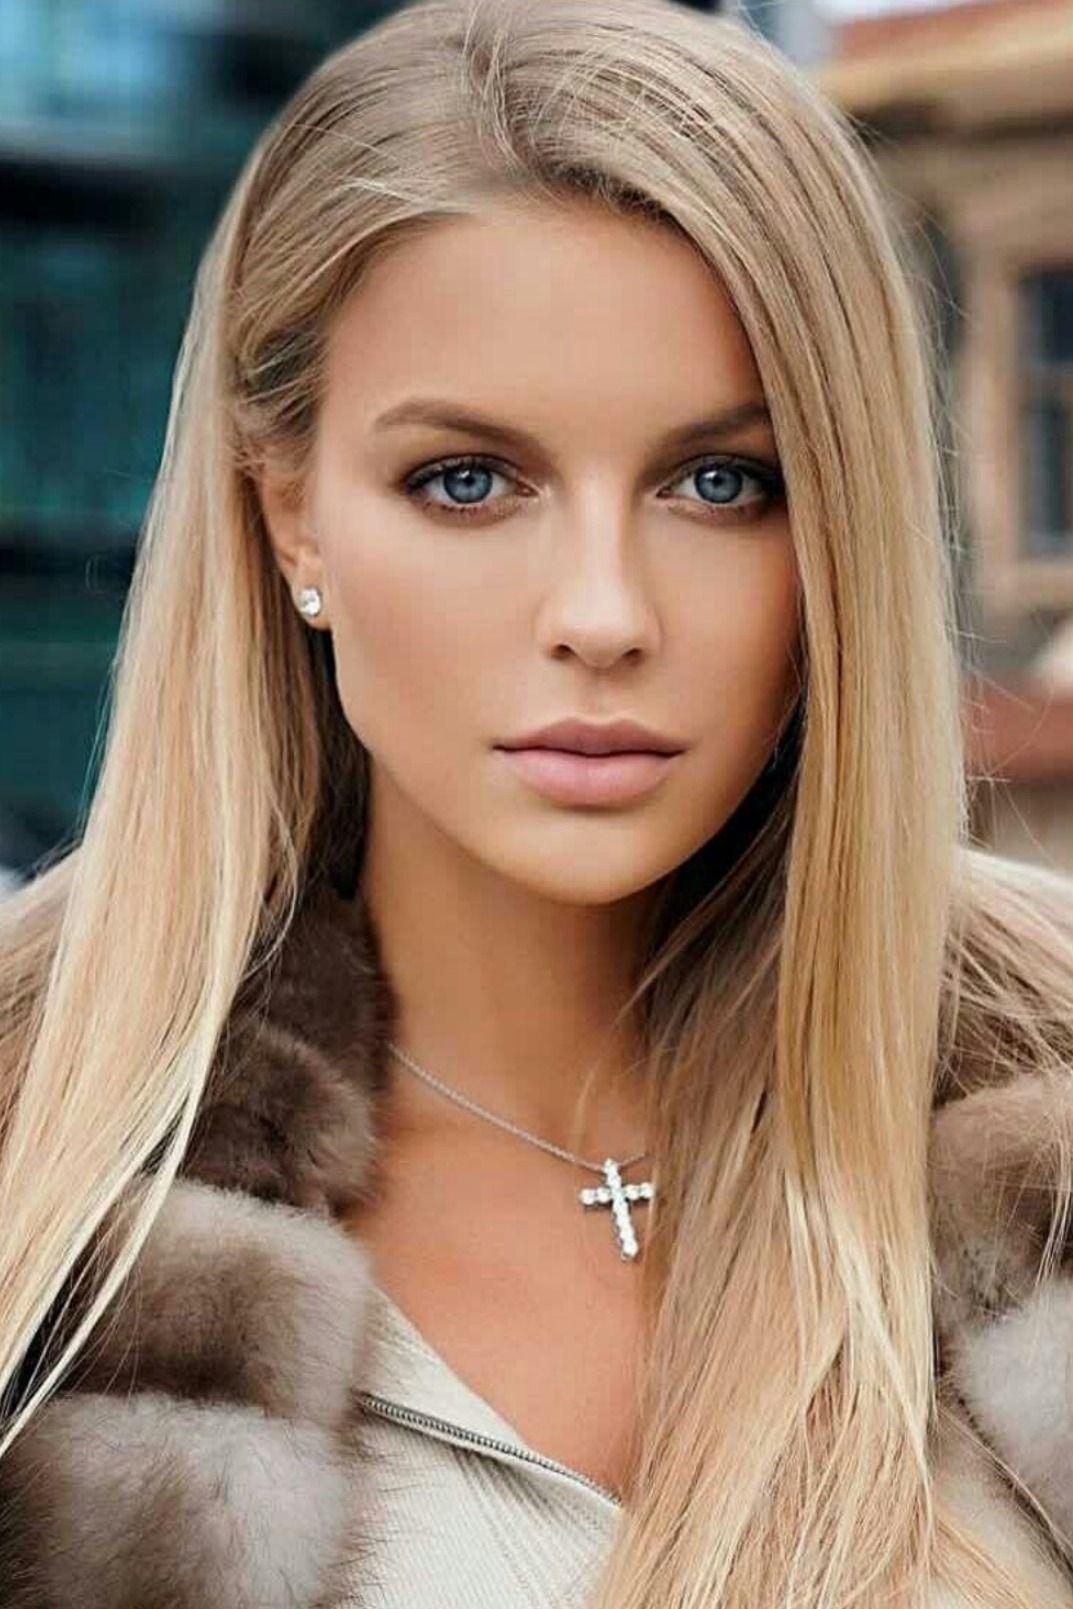 women model blonde makeup beauty in 2020 Haarfarben